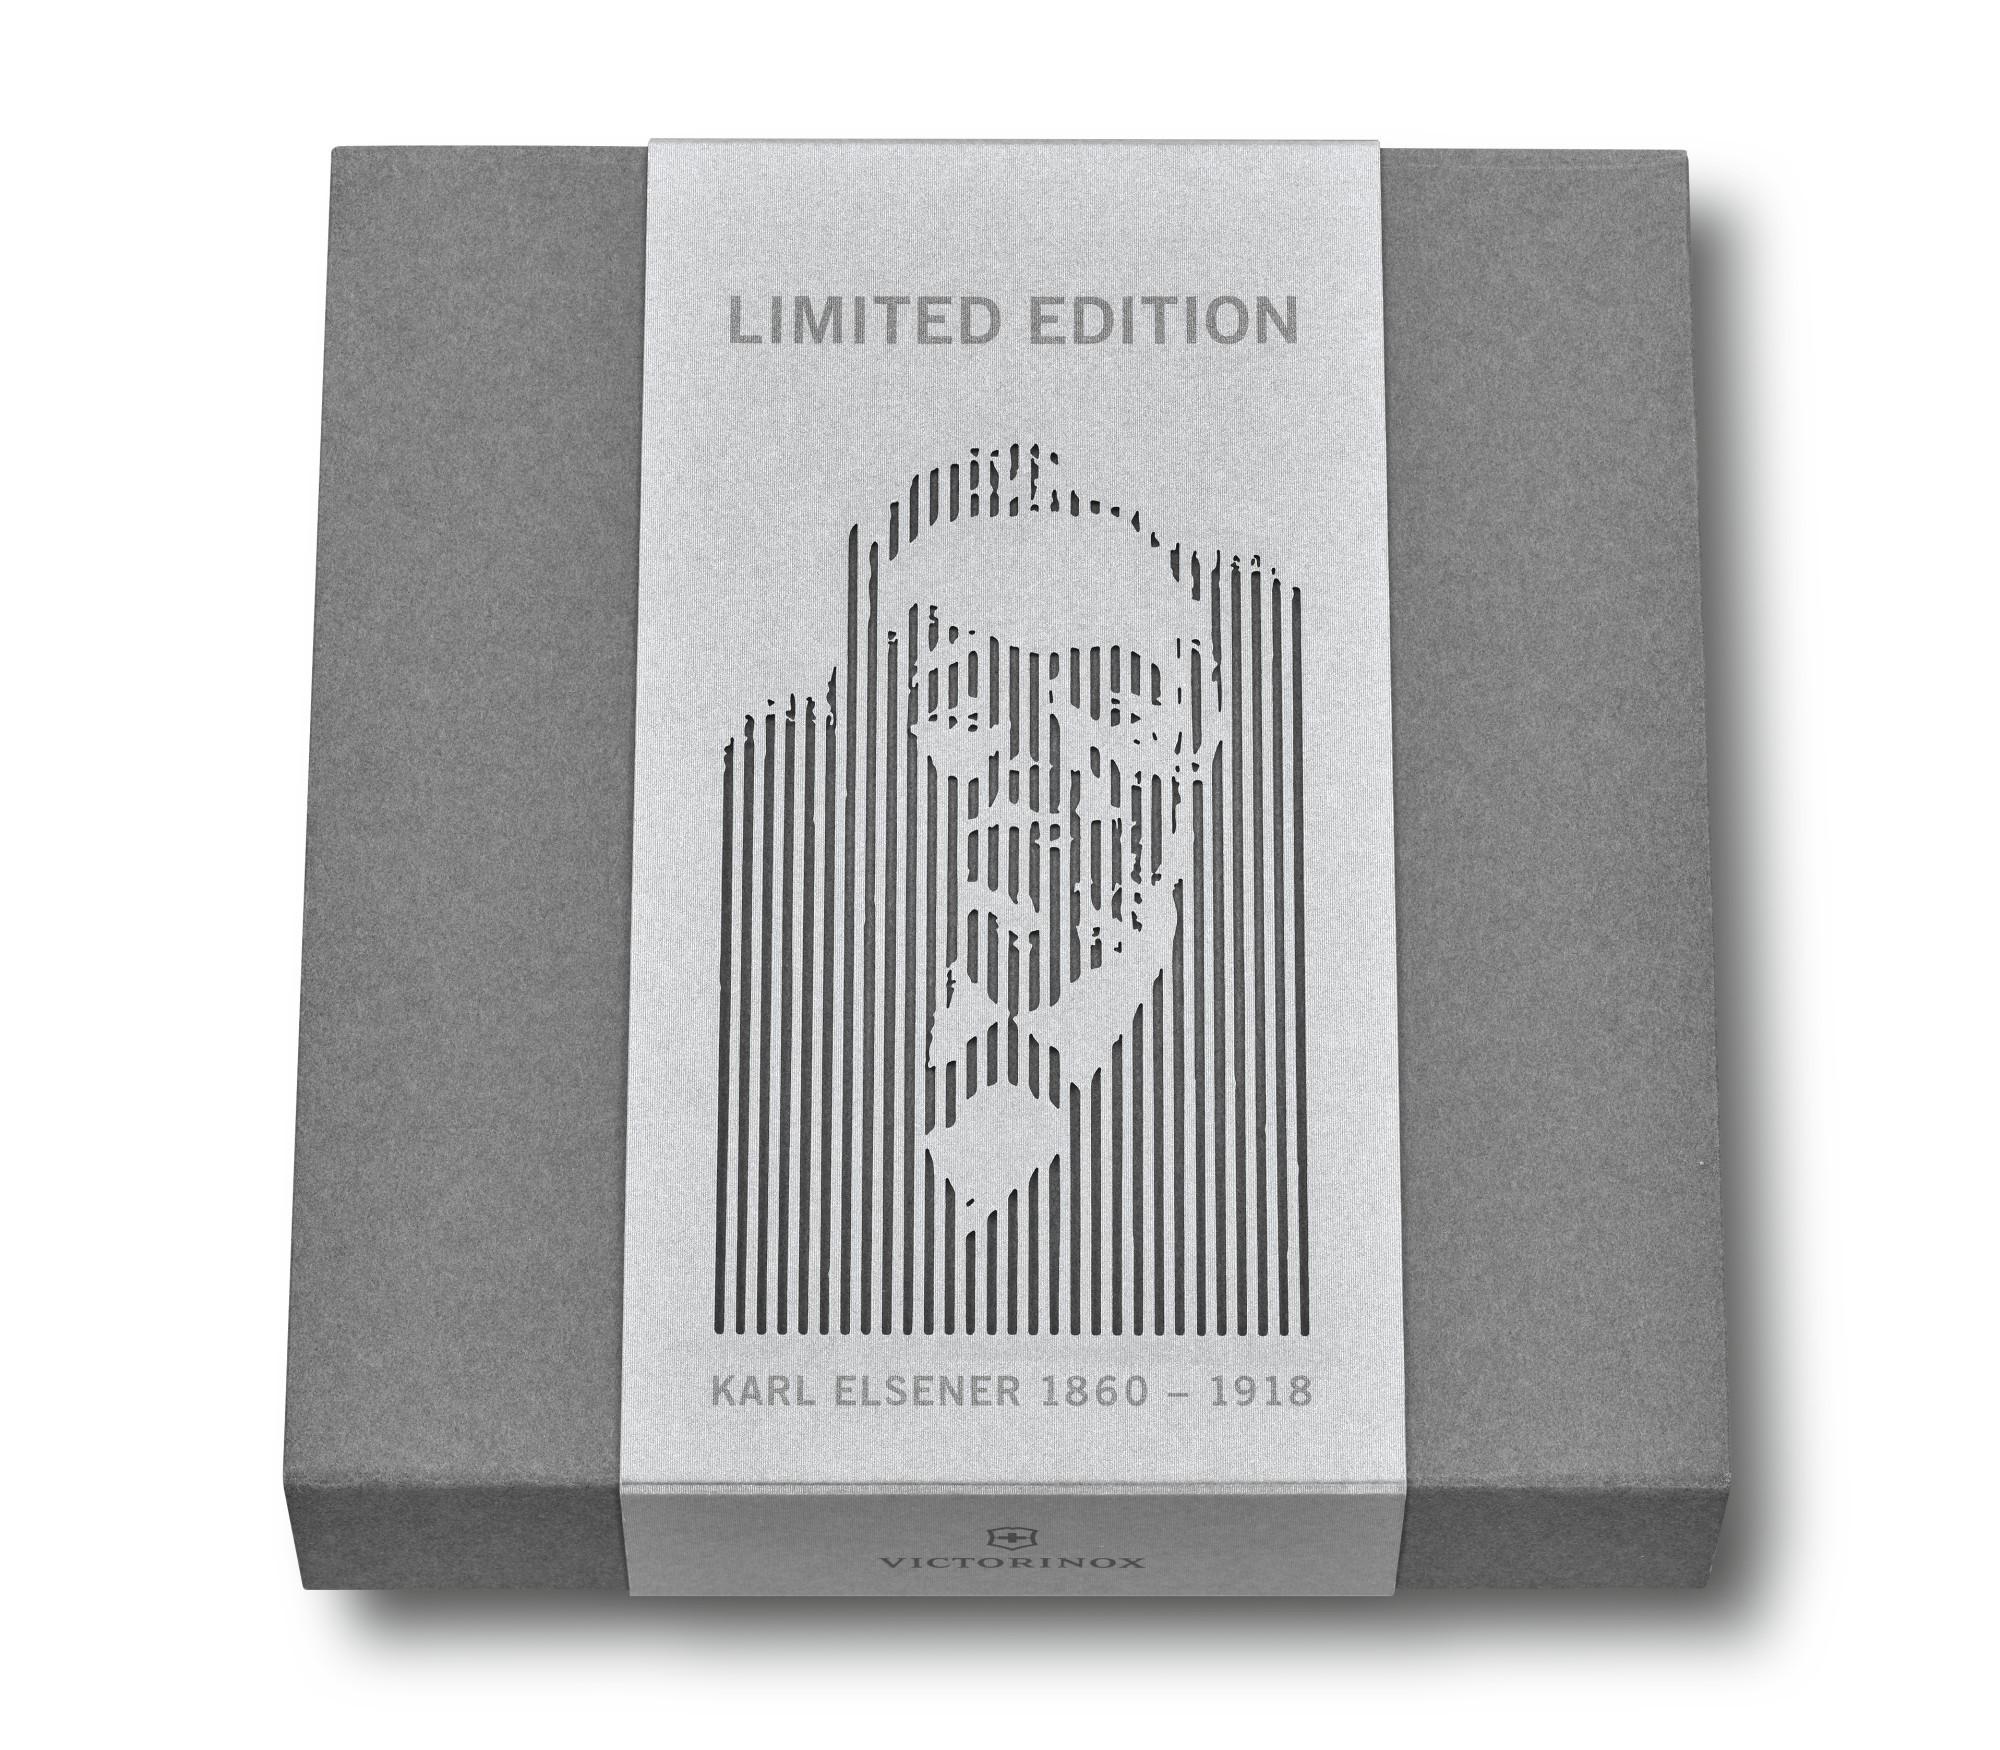 Victorinox Karl Elsener limitovana edicia krabica